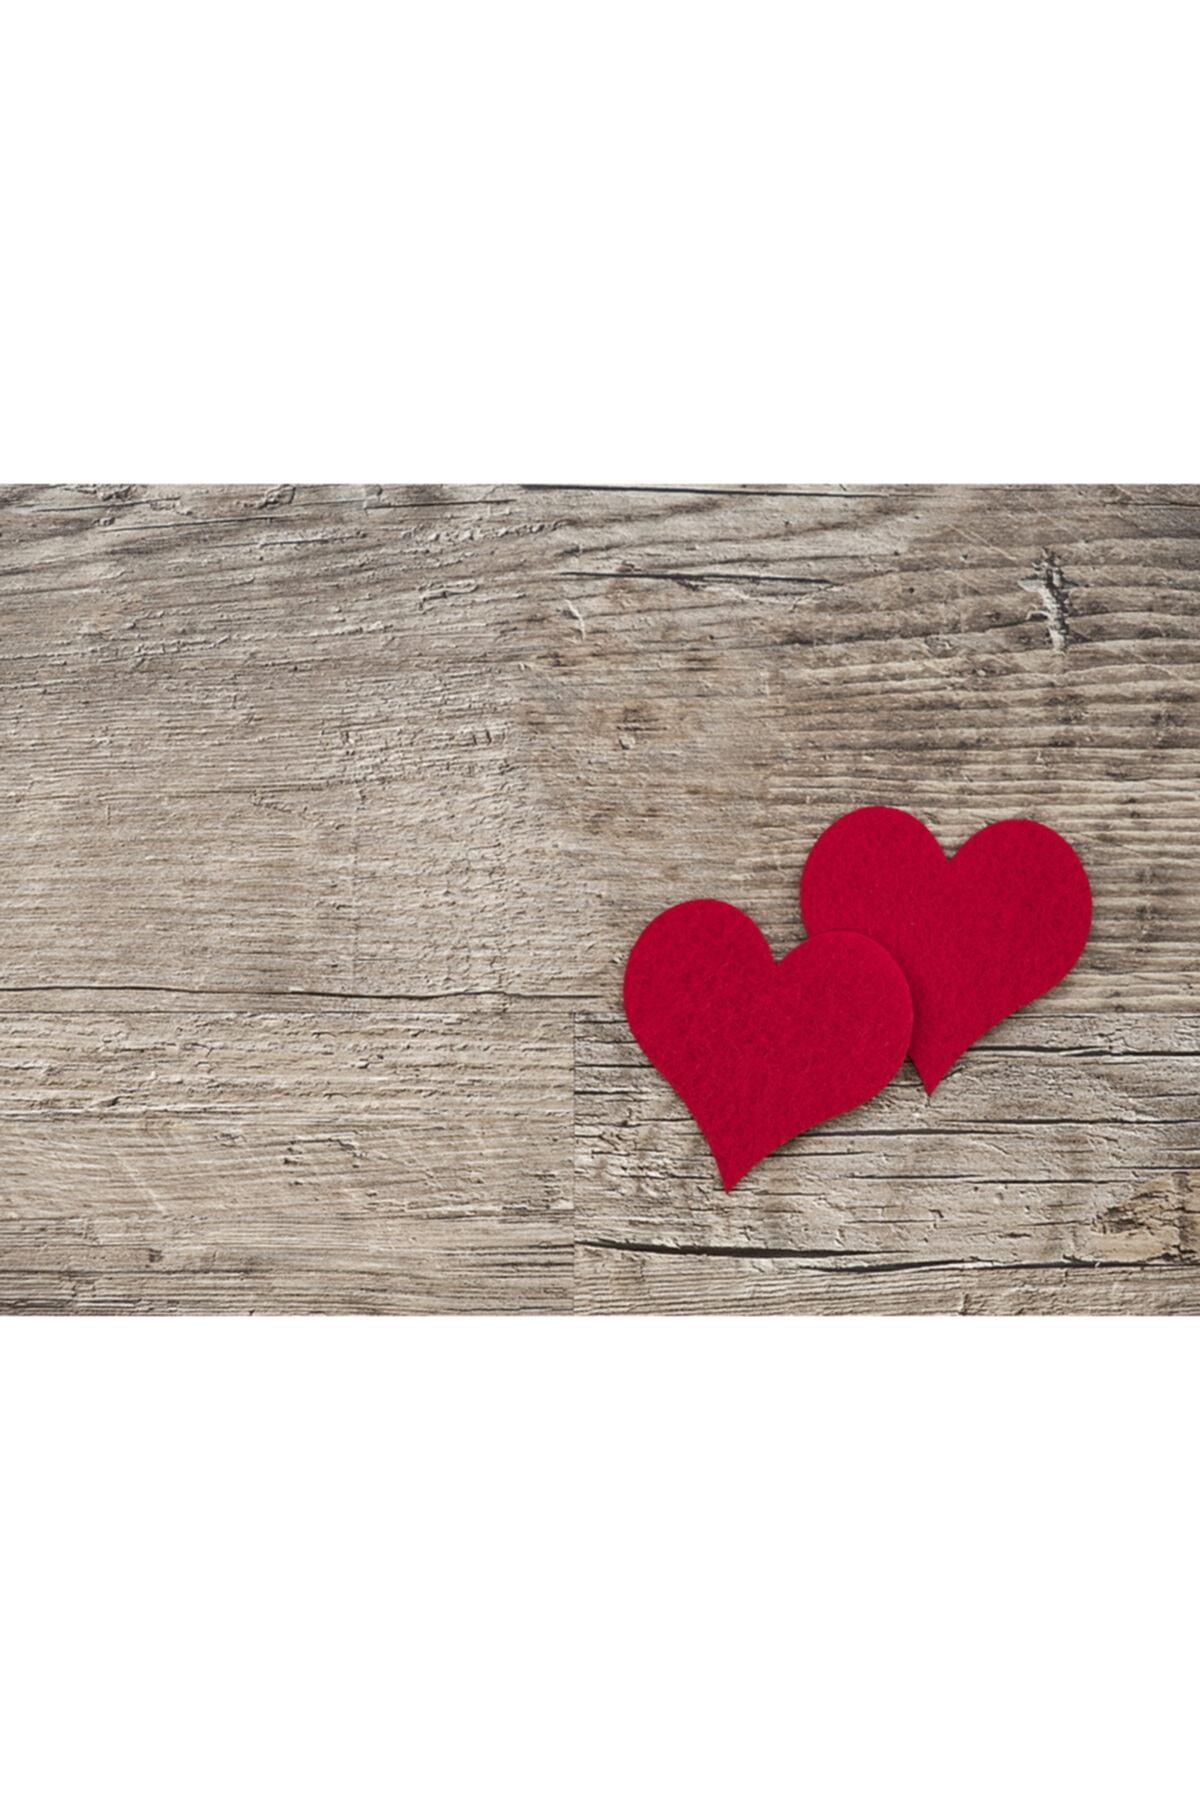 ELF Design Kırmızı Kalp Ahşap Amerikan Servis 4 Lü 2